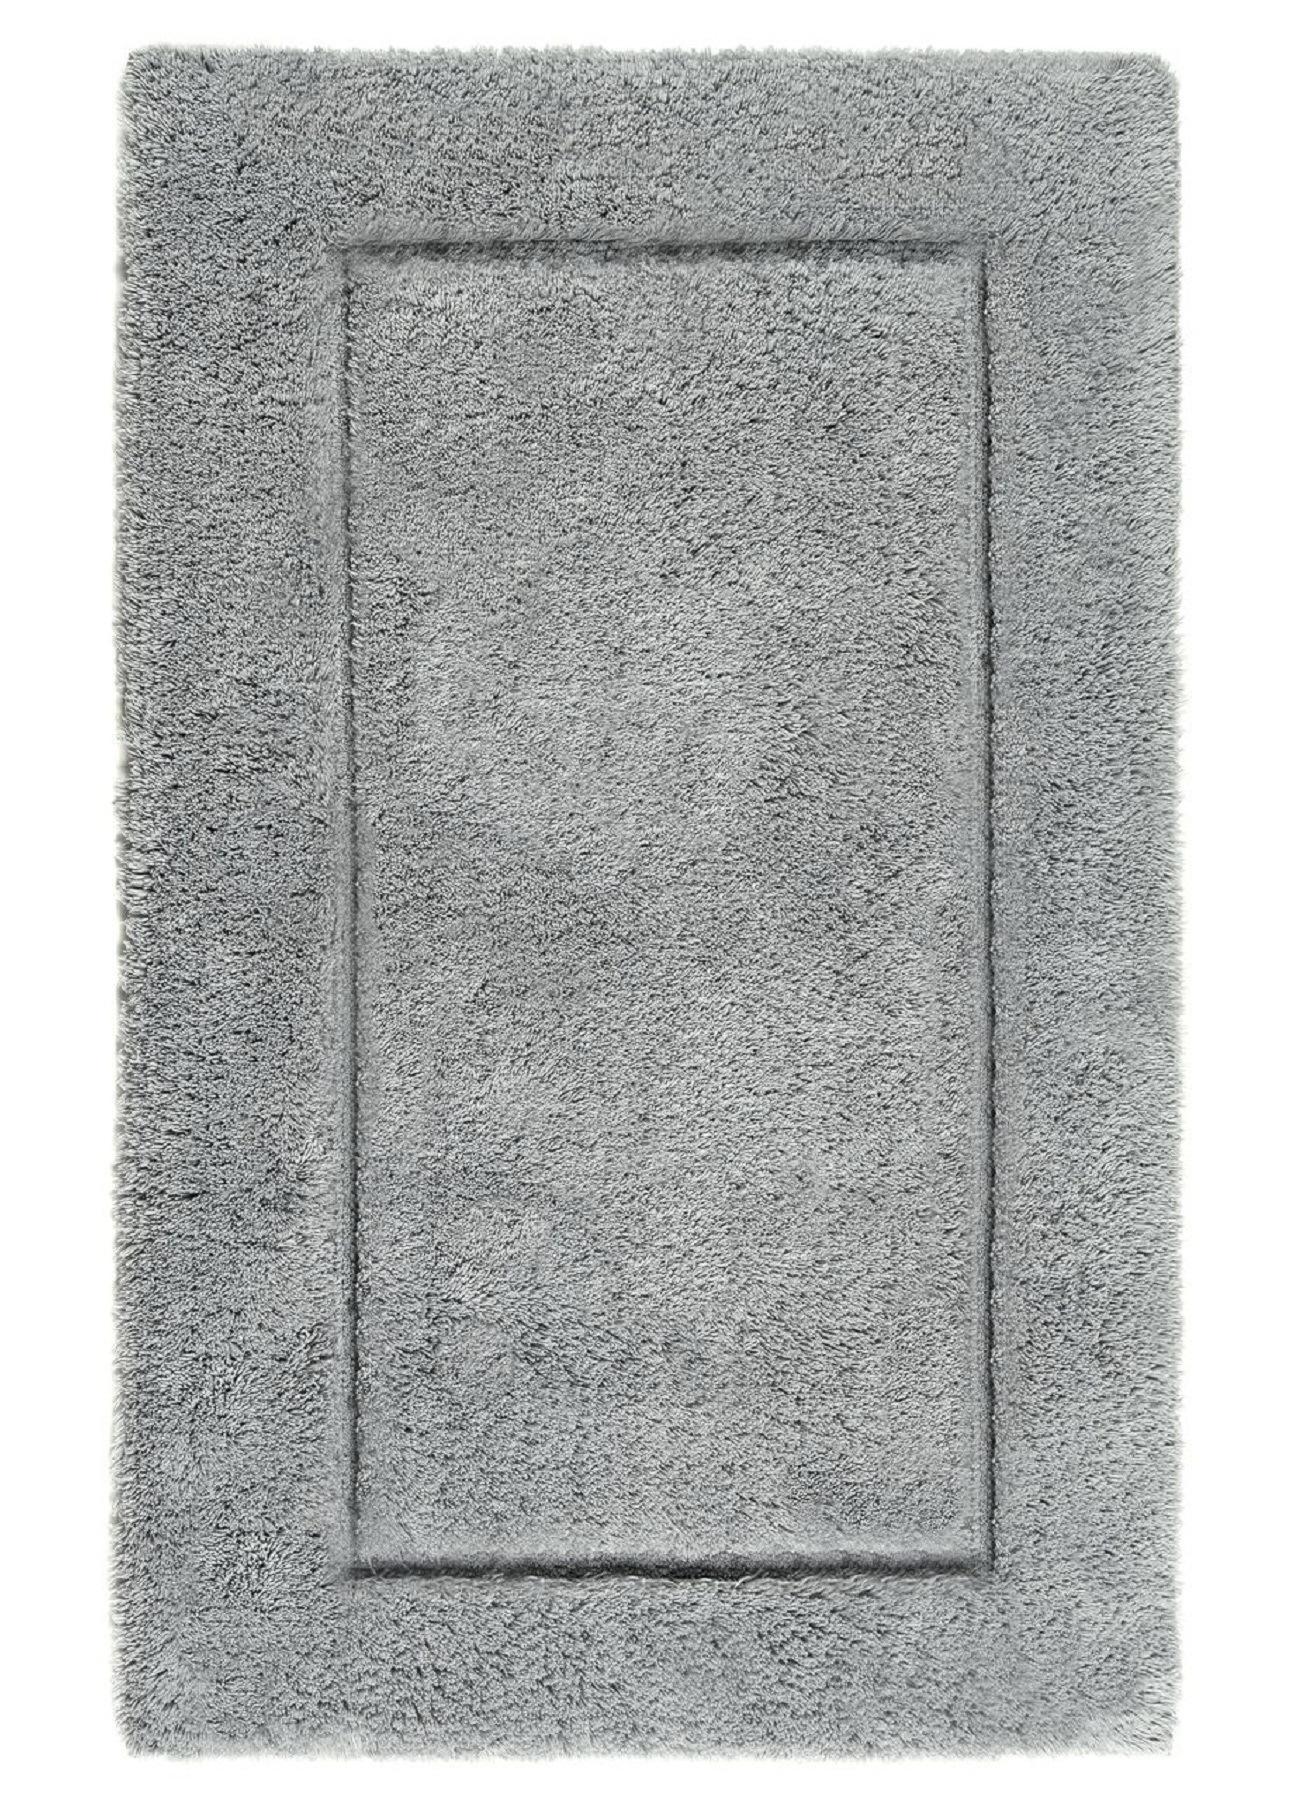 Коврики для ванной Коврик для ванной 61х101 Kassatex Classic Egyptian Anthracite kovrik-61h101-kassatex-classic-egyptian-anthracite-ssha-portugaliya.jpeg